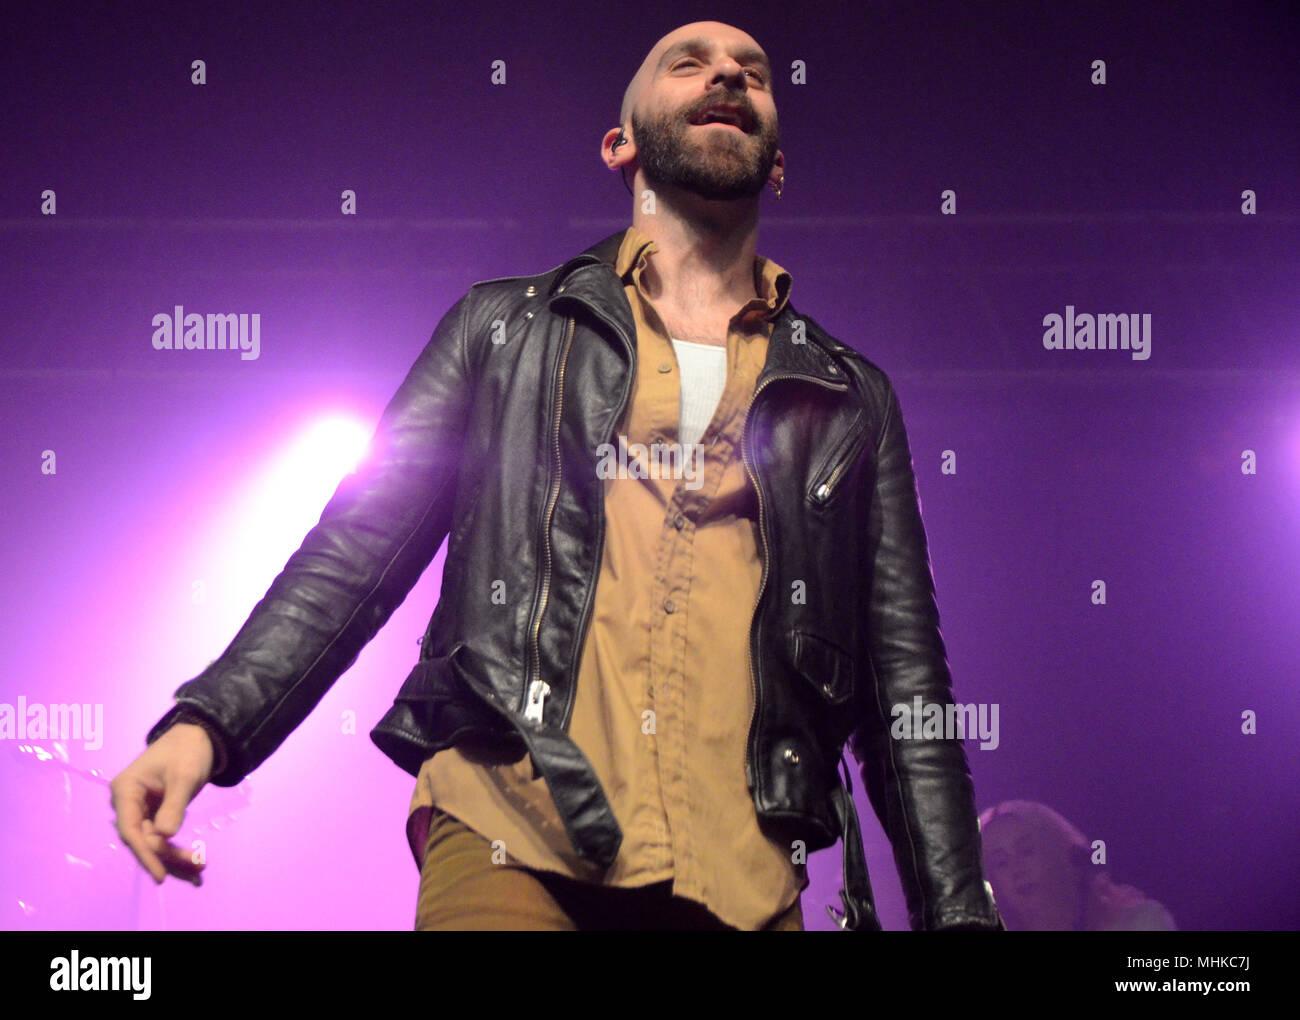 Milwaukee, Wisconsin, USA  29th Apr, 2018  Lead singer Sam